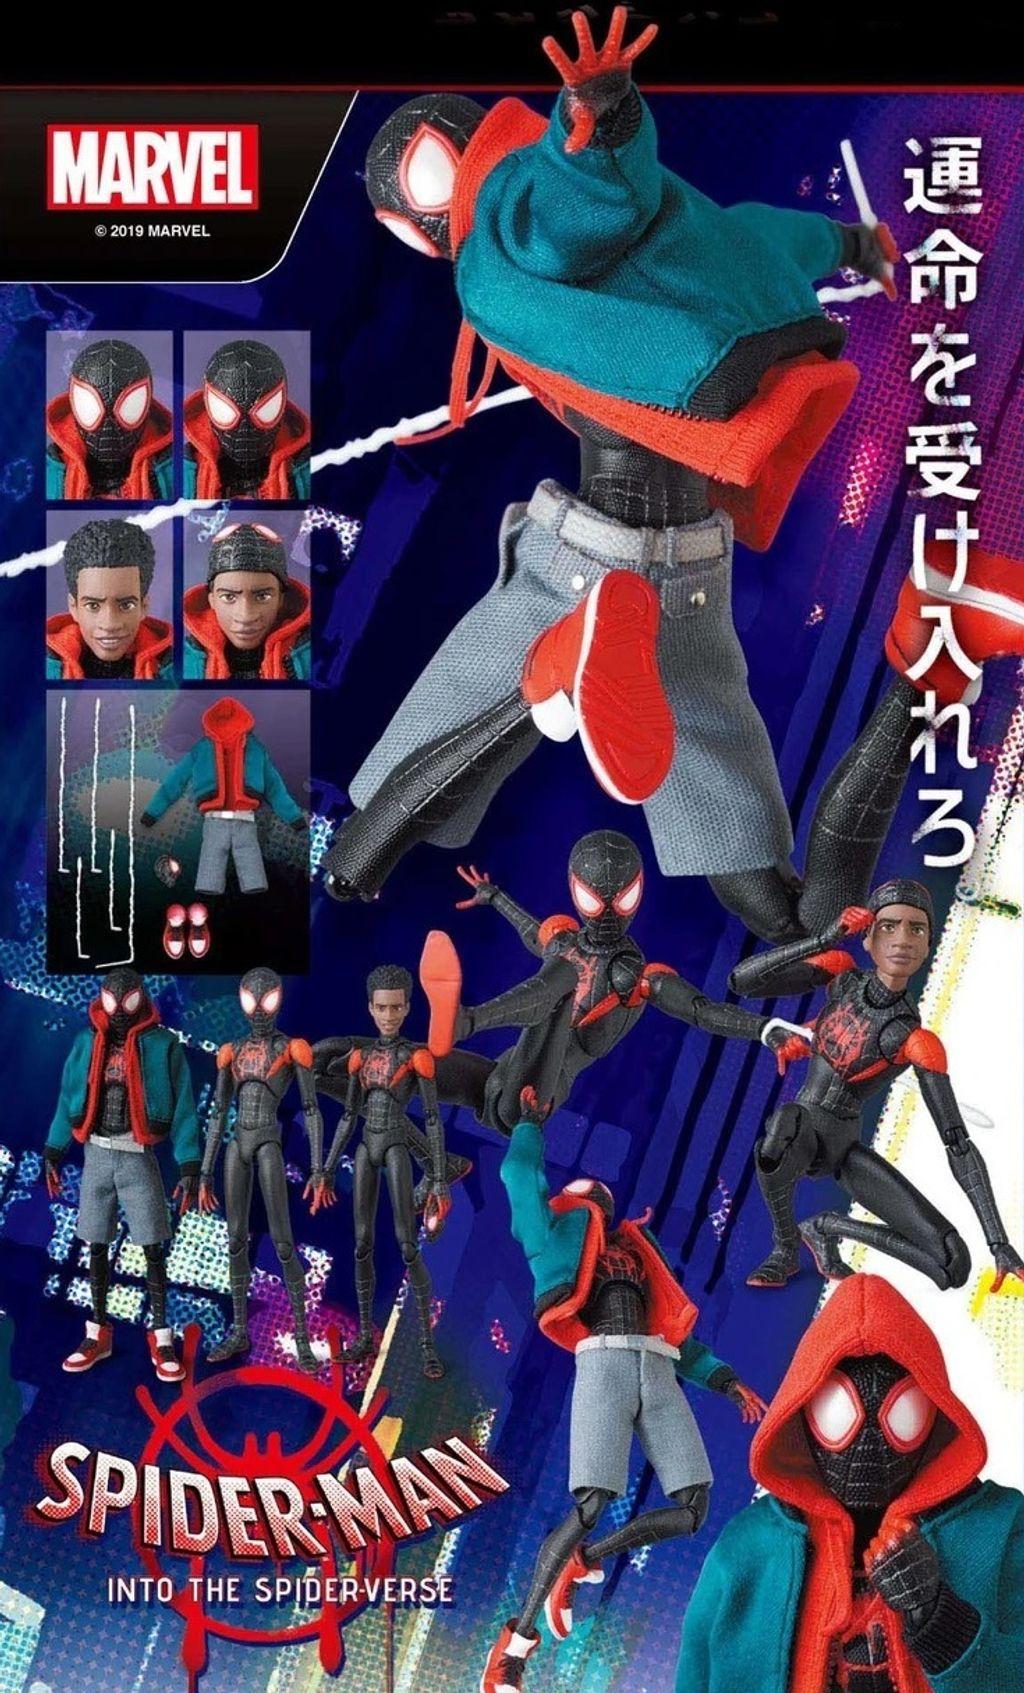 [107] SpiderMan_MilesMorales_ITSV 000.jpg